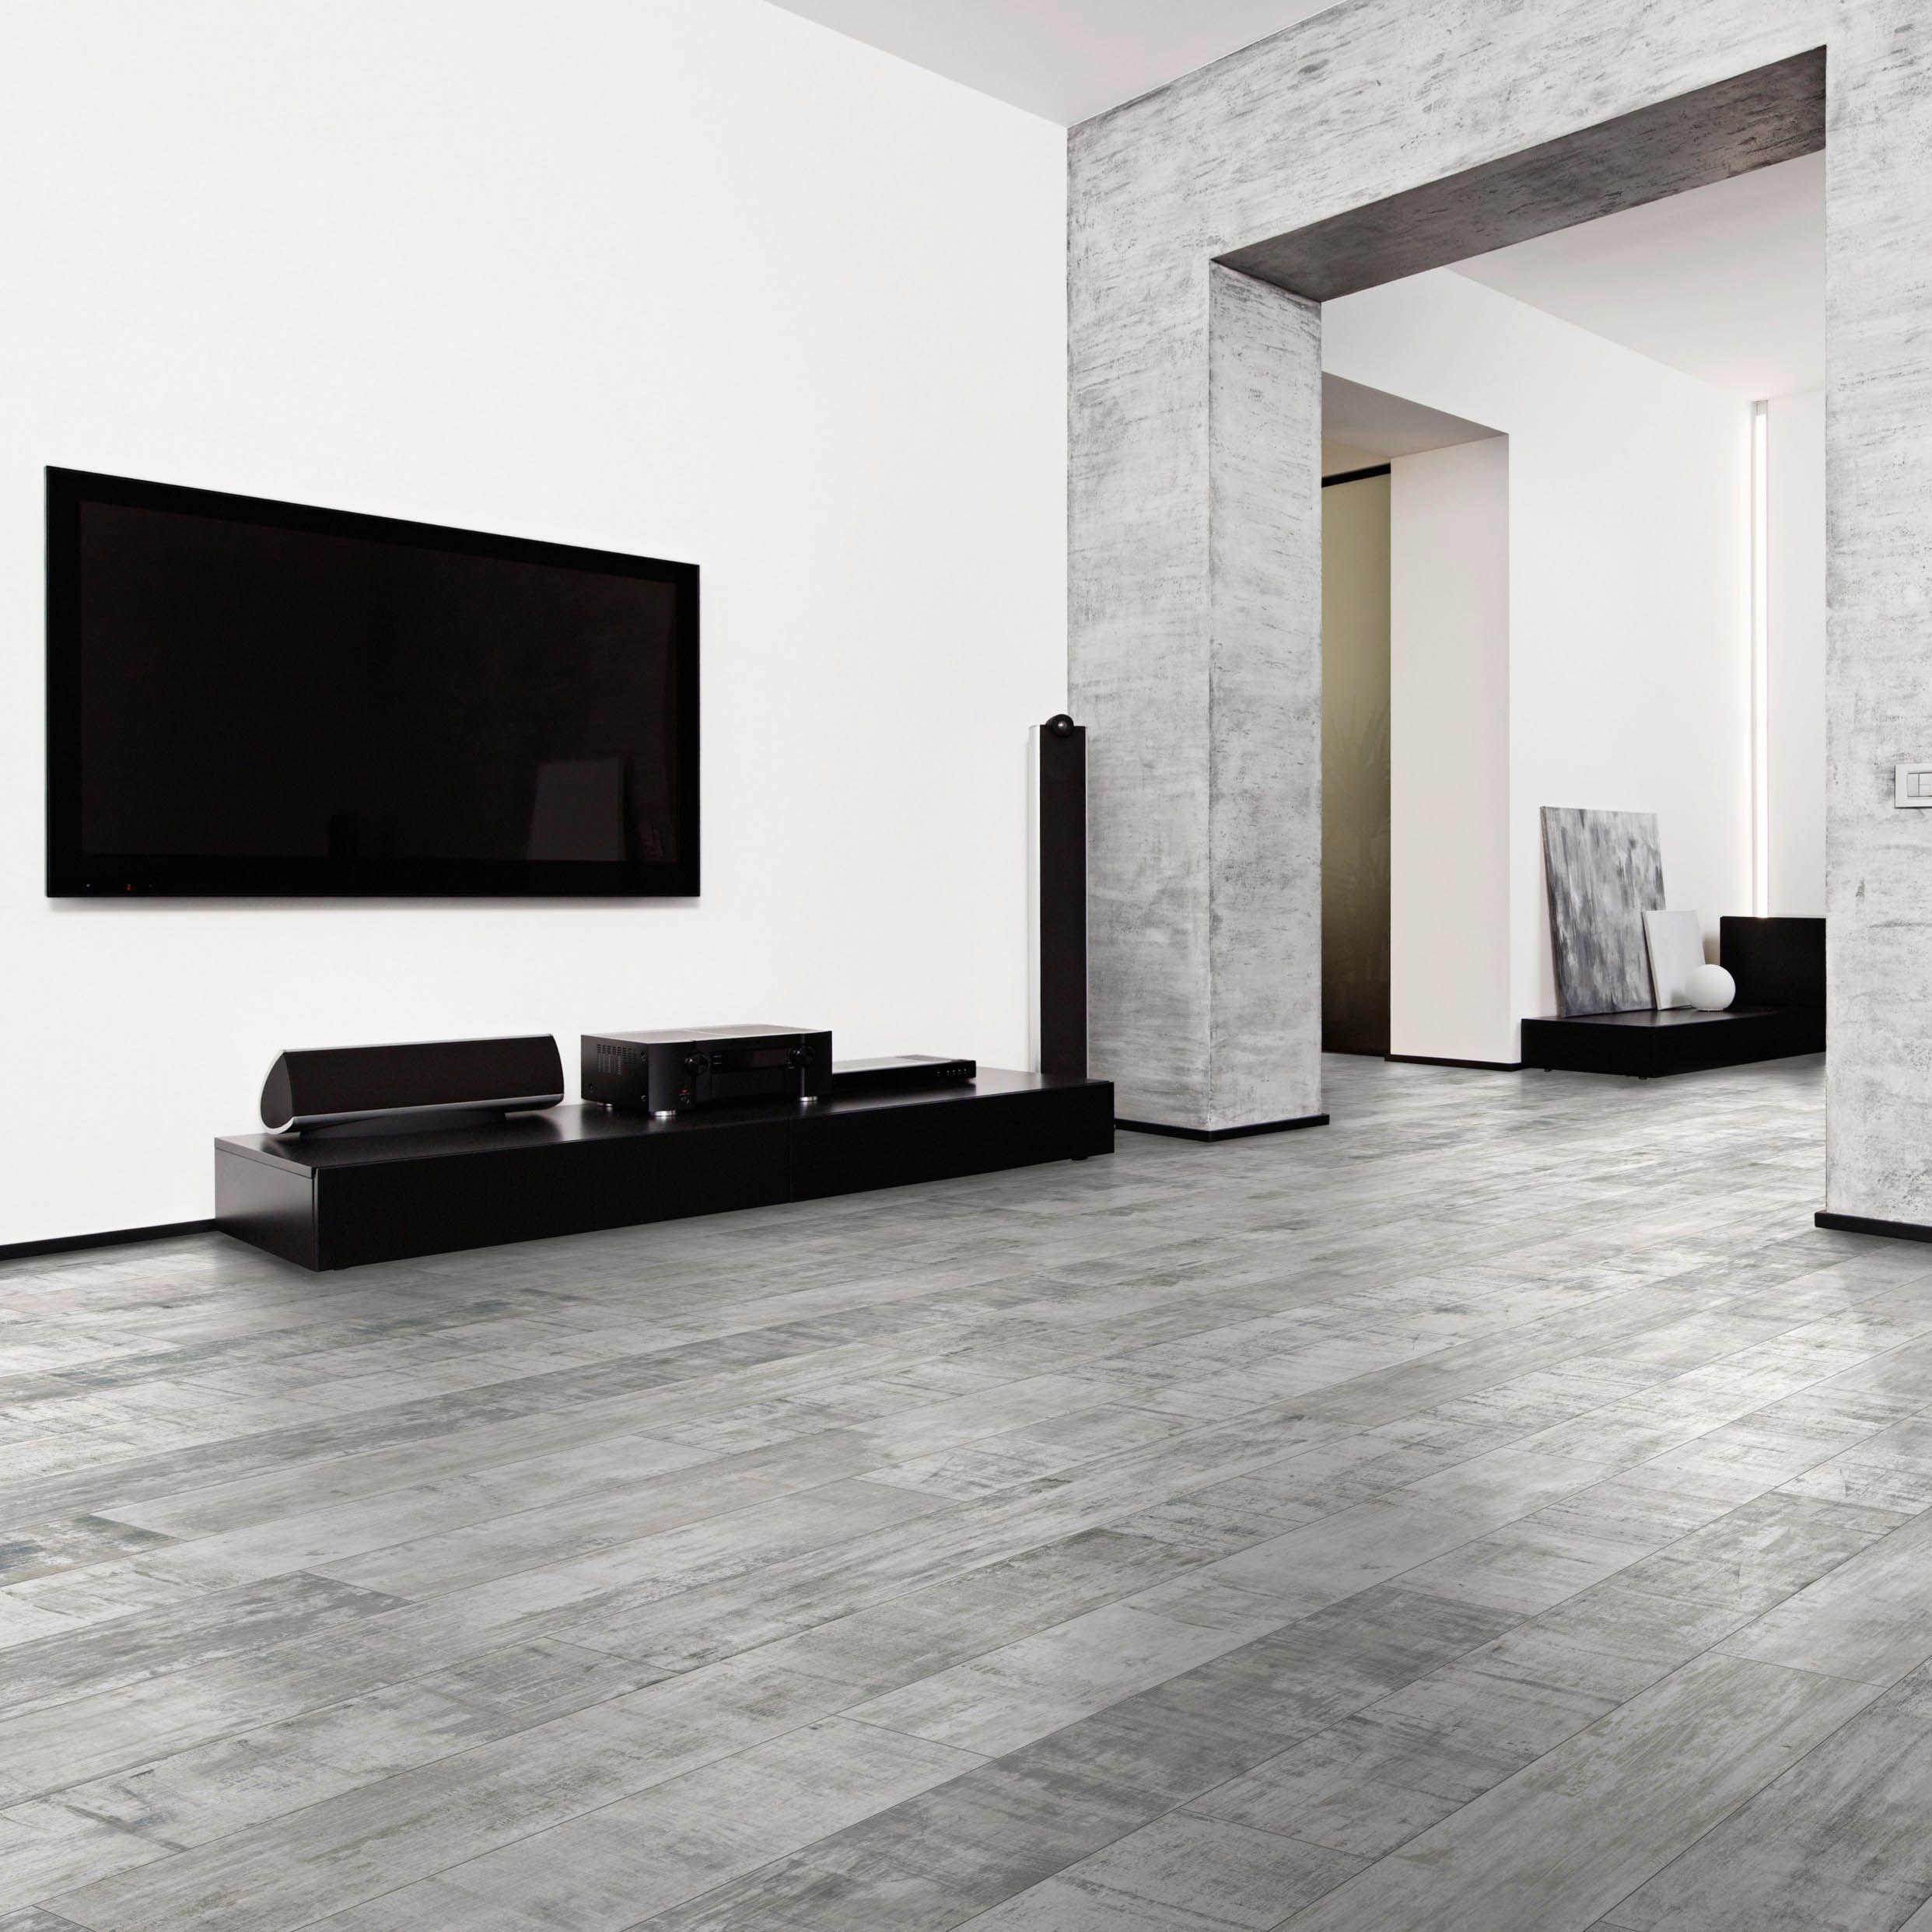 Belcanto Malibu Pine Effect Laminate Flooring 1.99 m Pack   Departments    DIY at B&Q